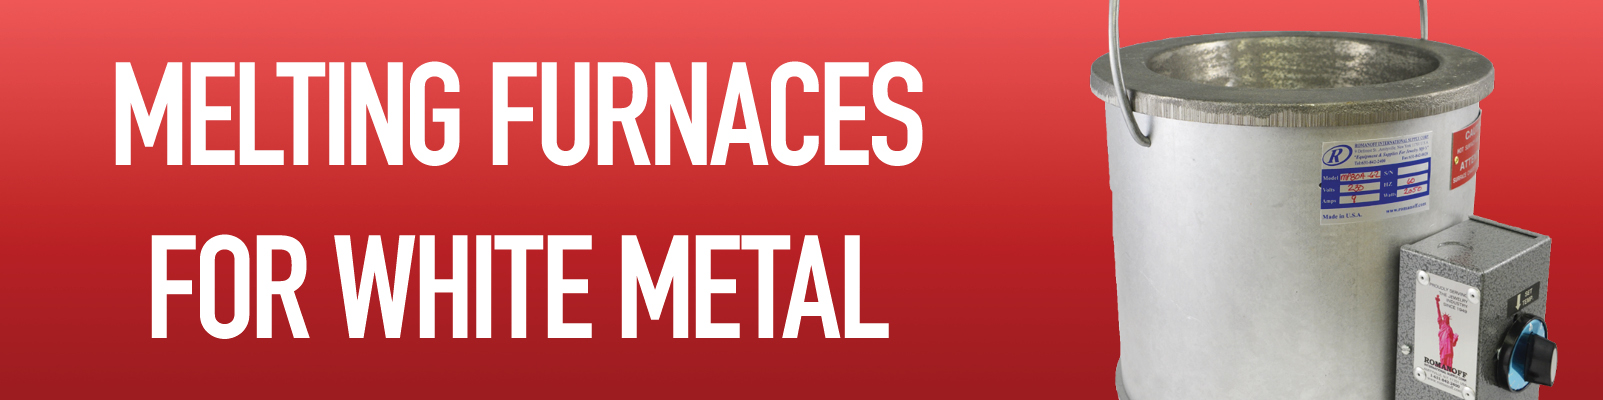 Furnaces & Vulcanizers